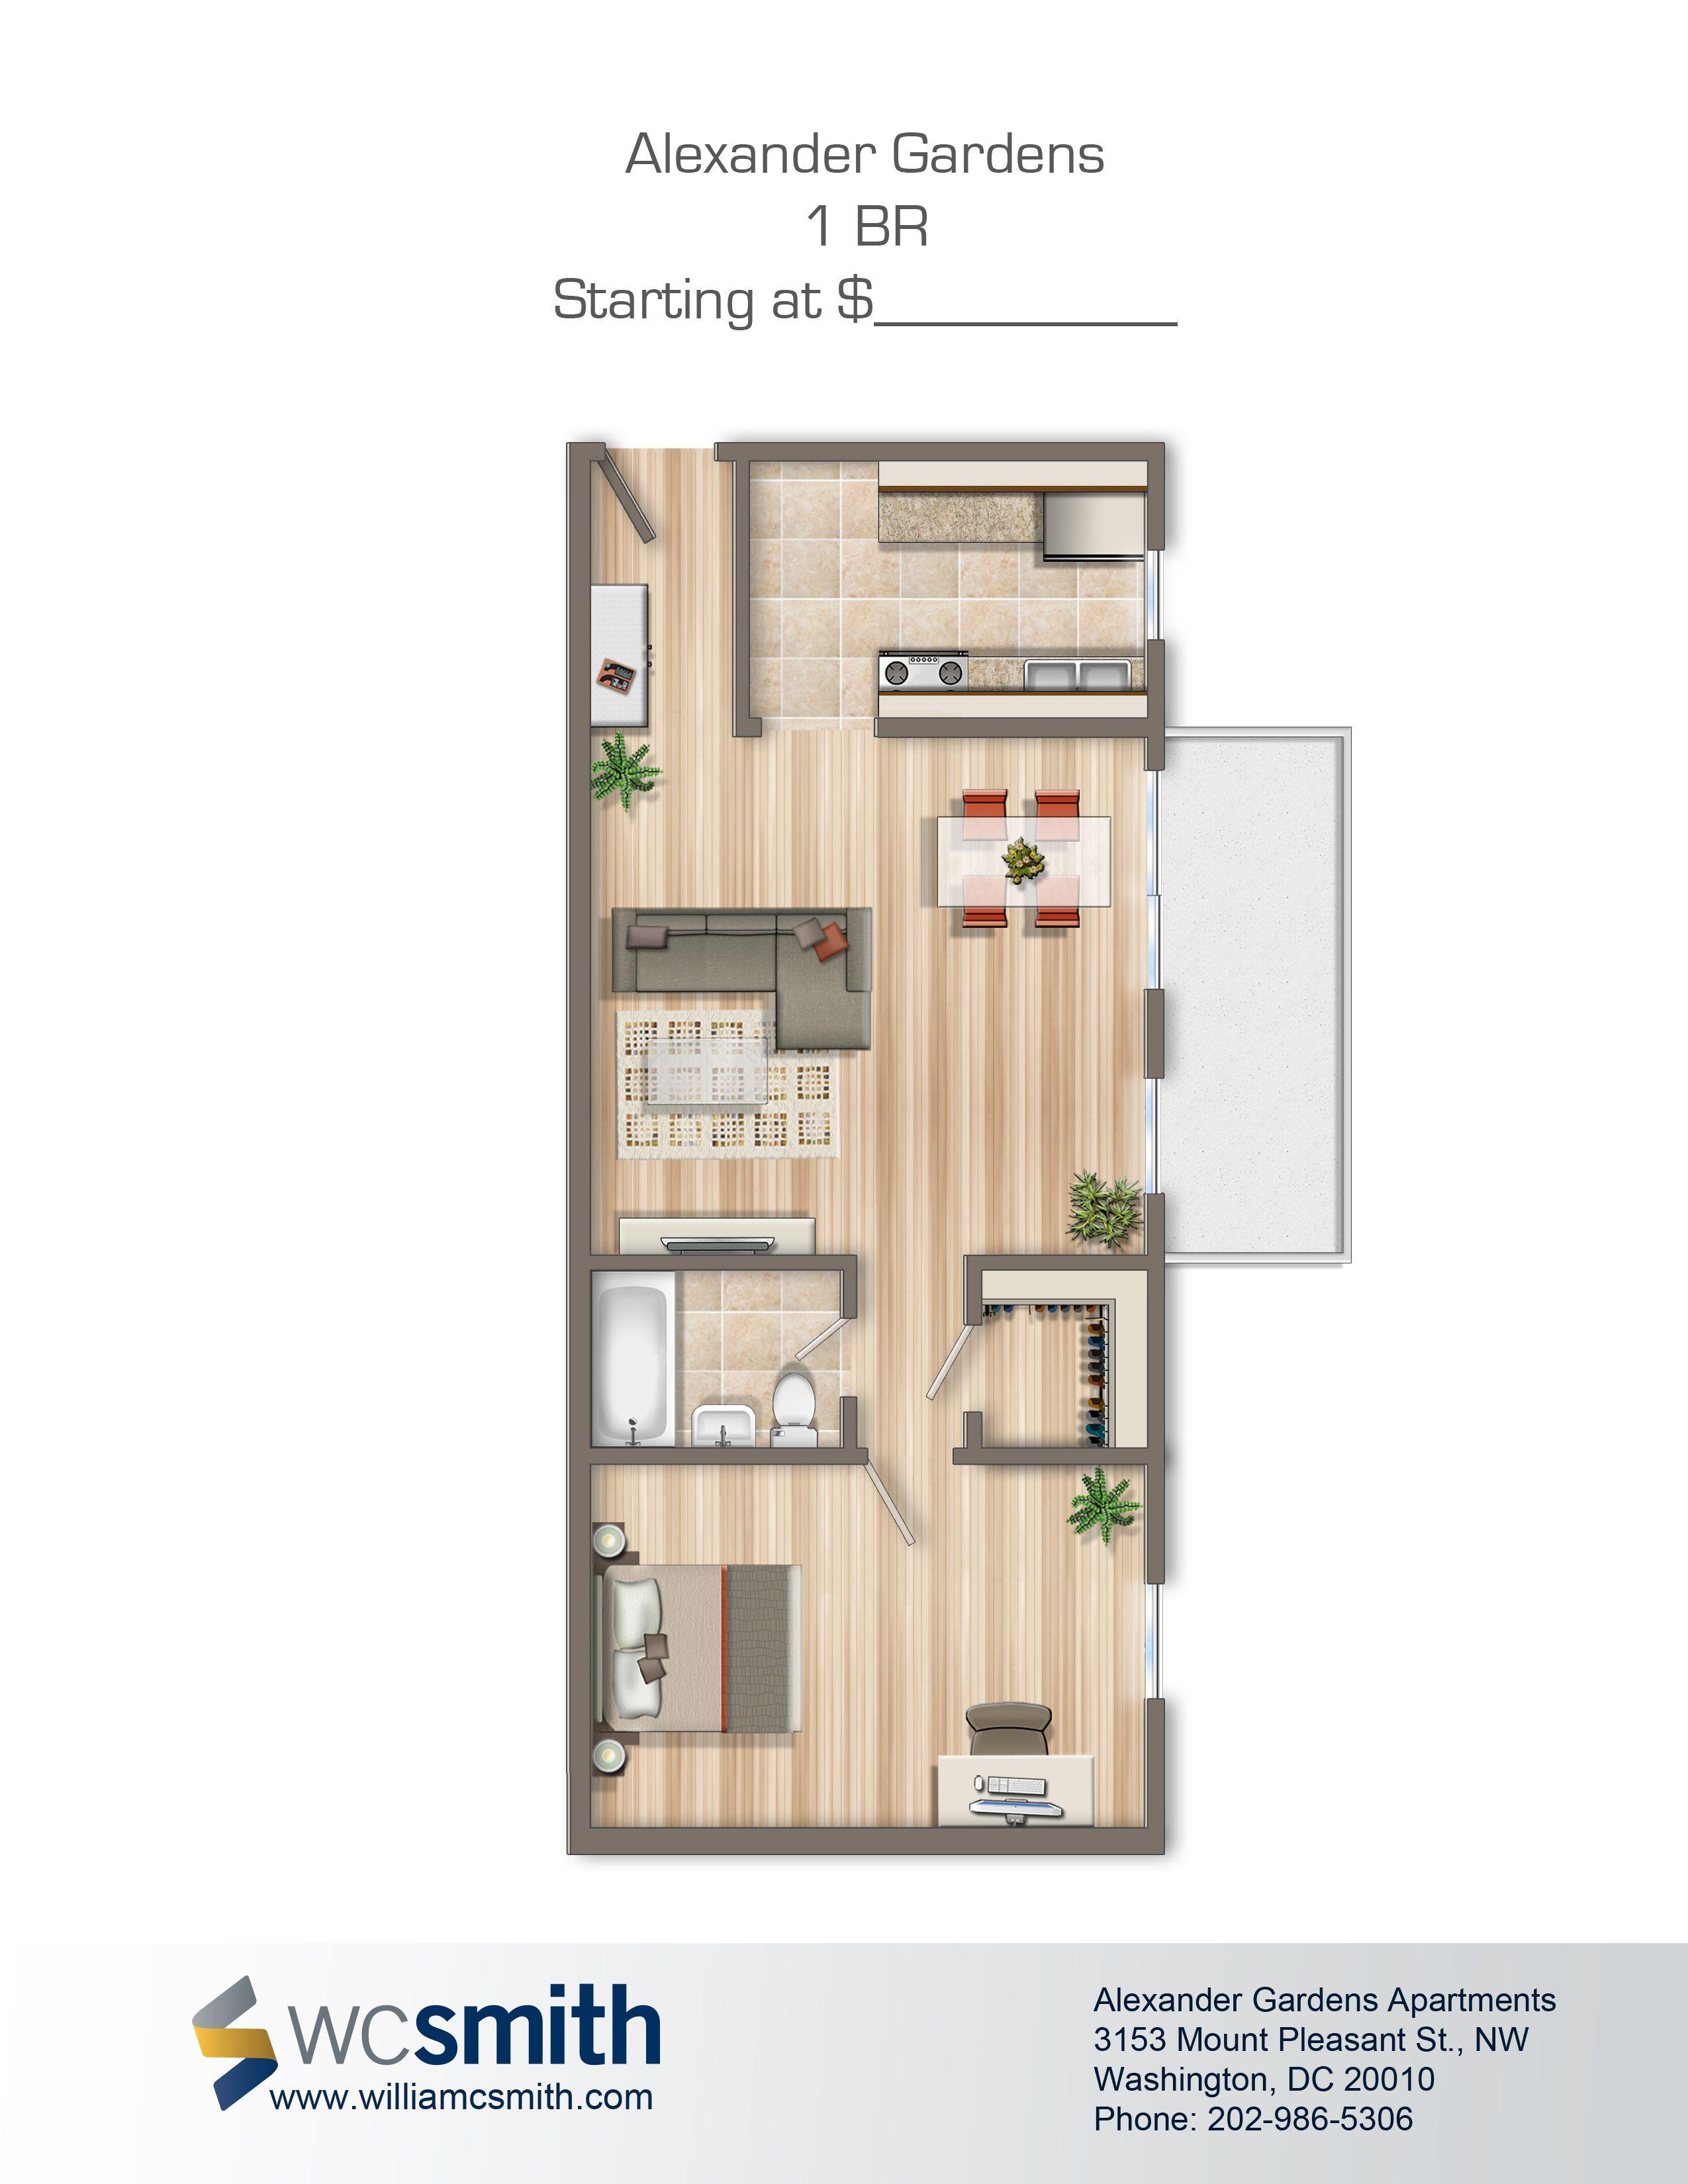 Alexander Gardens Apartments In Washington DC in 2020